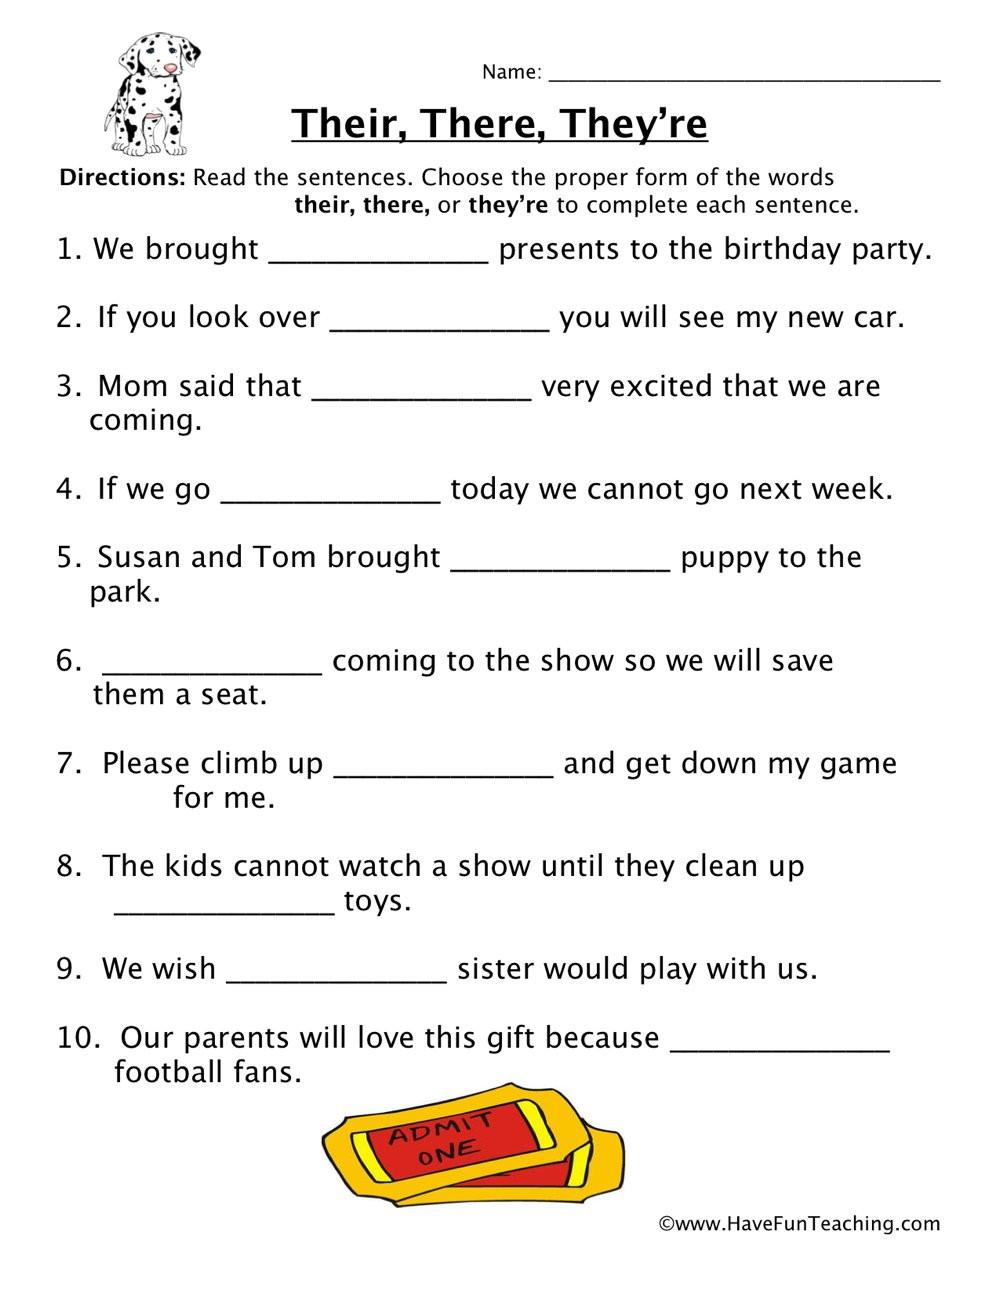 Homonyms Worksheets 5th Grade Homophones Worksheets